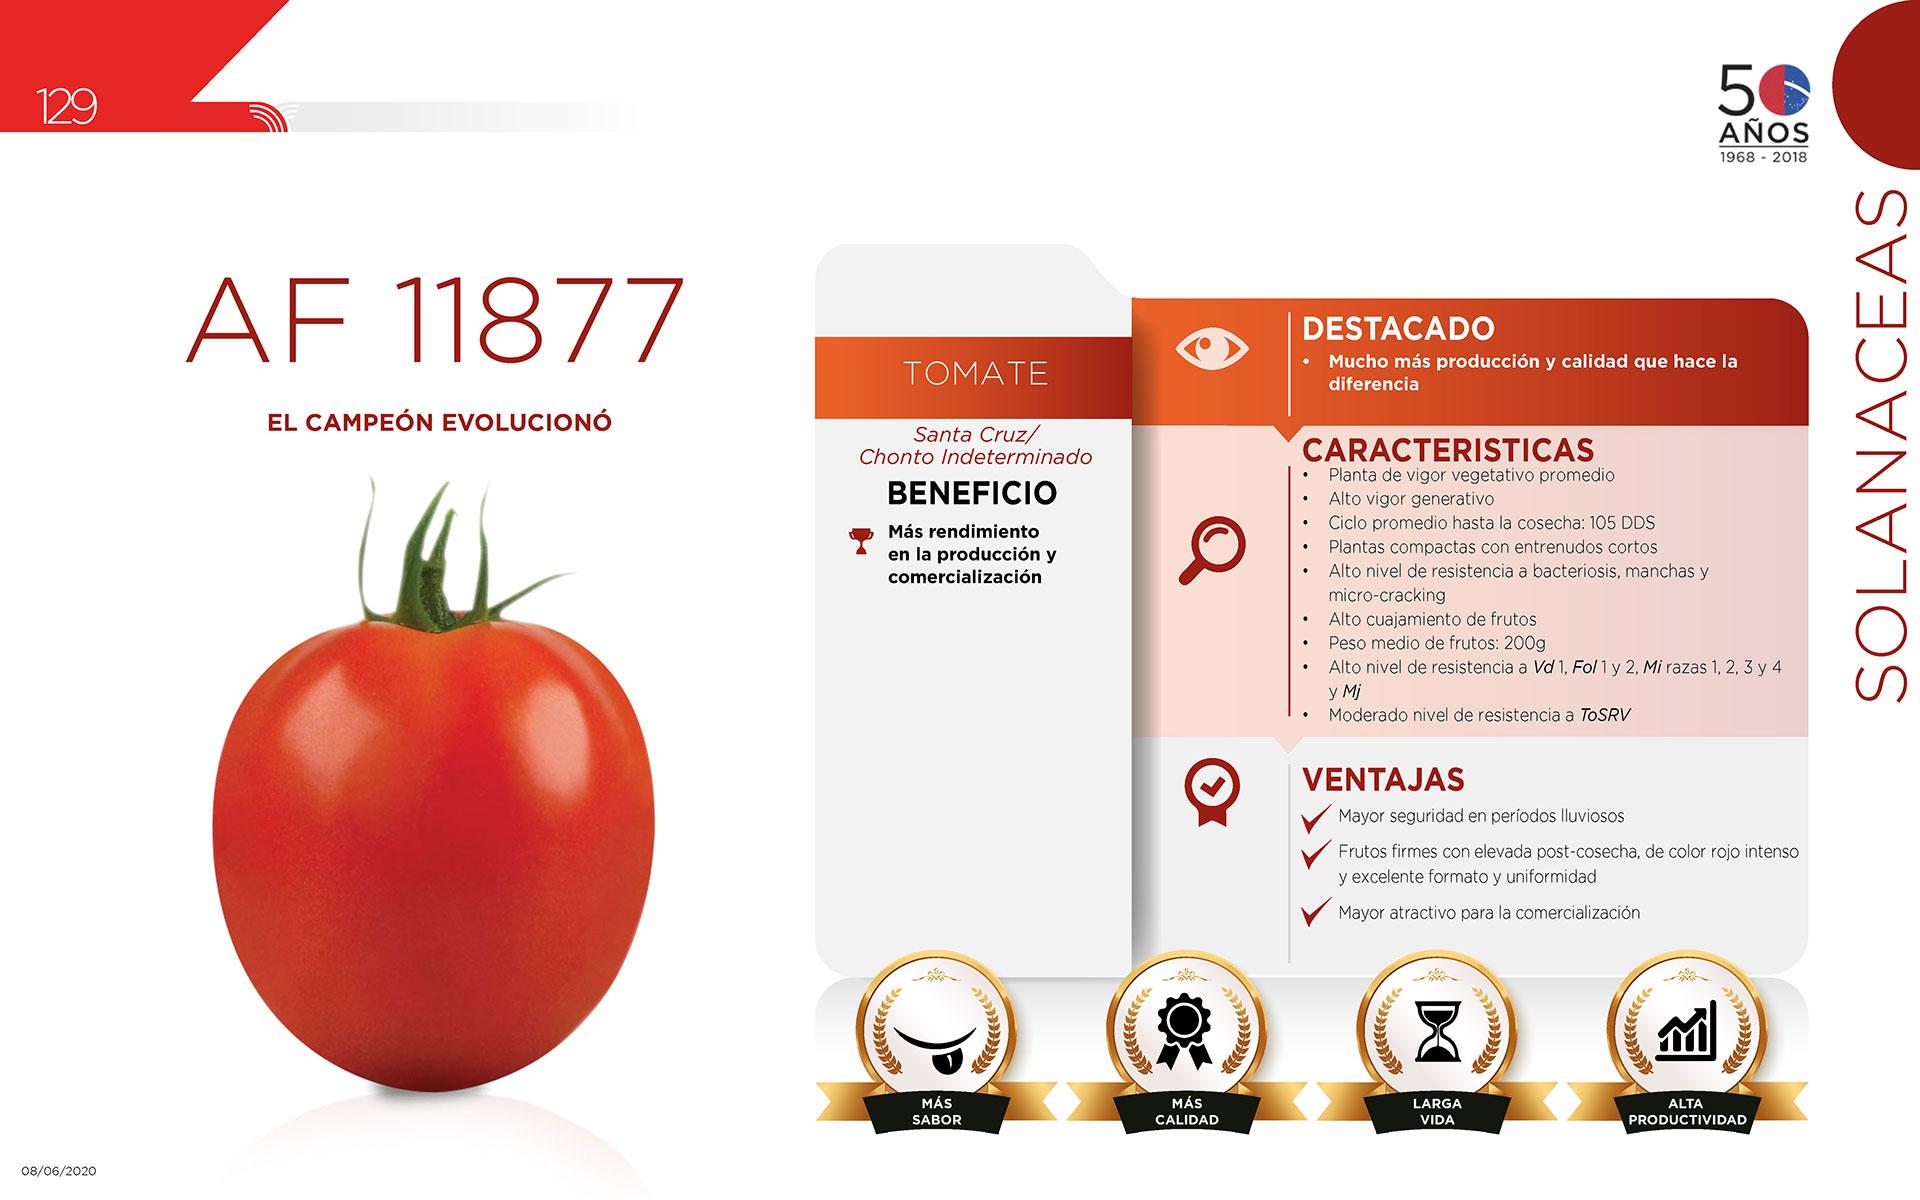 AF 11877 - Solanaceas